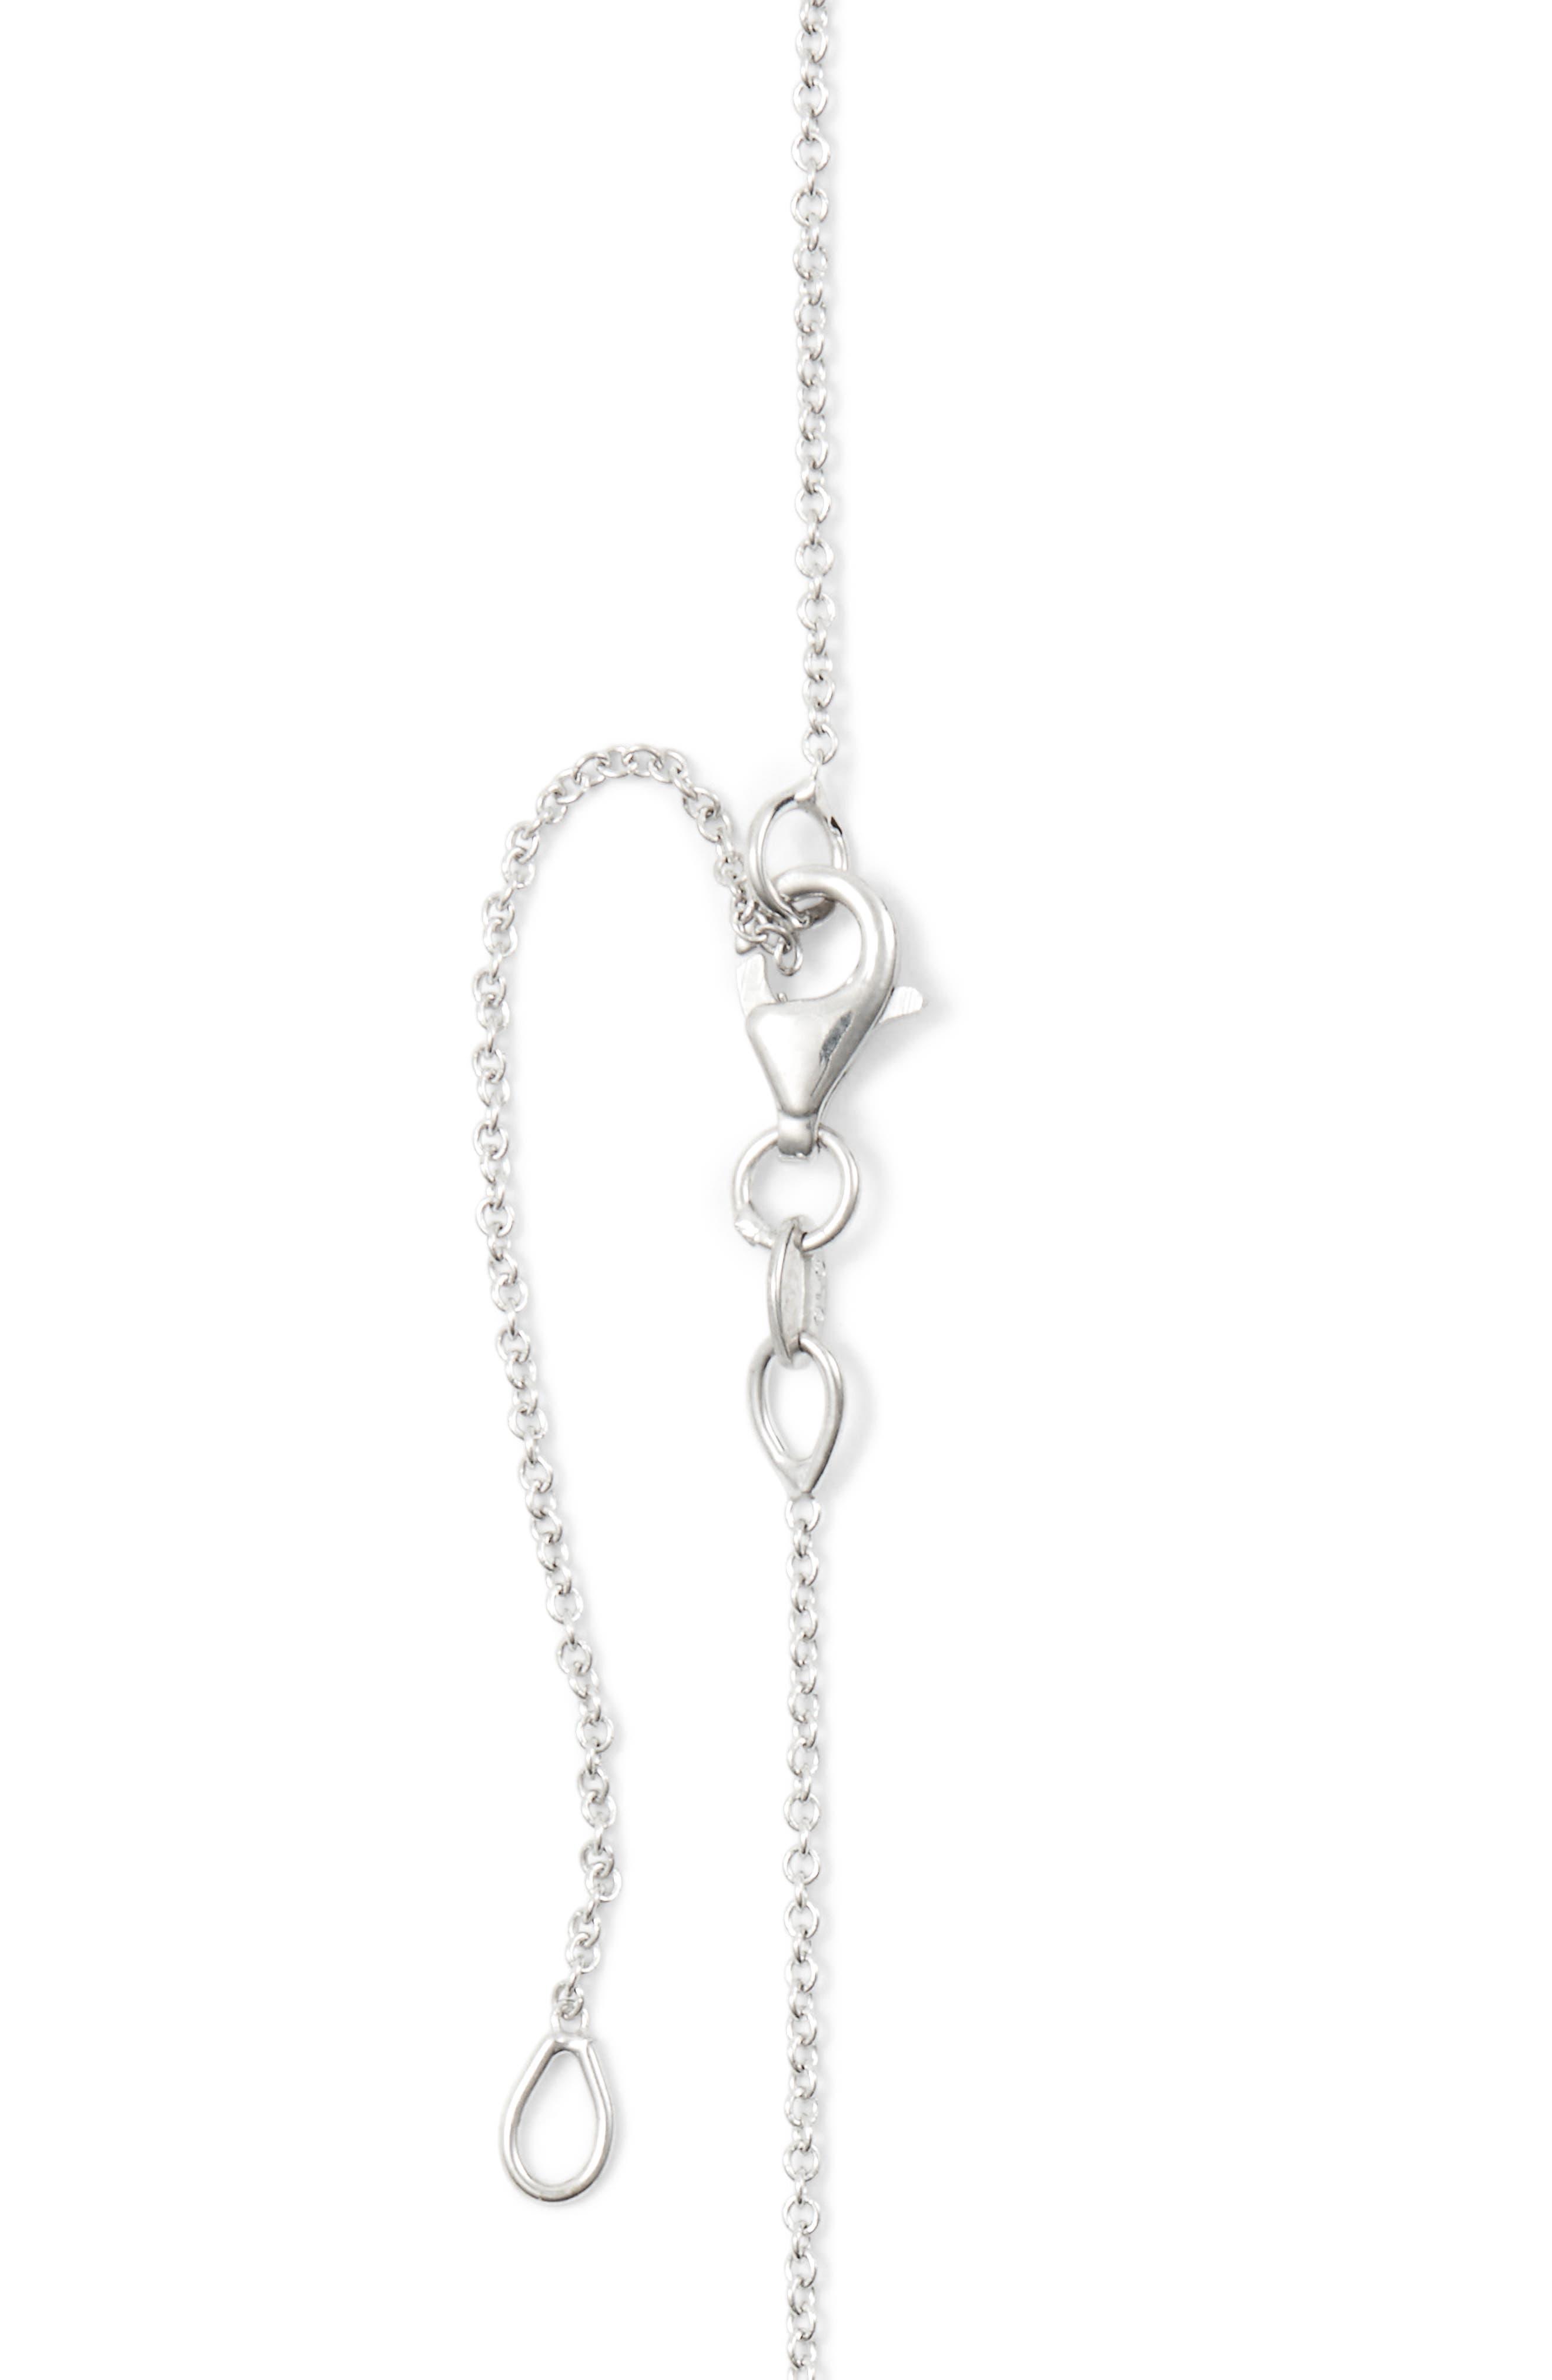 Diamond Heart Pendant Necklace,                             Alternate thumbnail 3, color,                             710